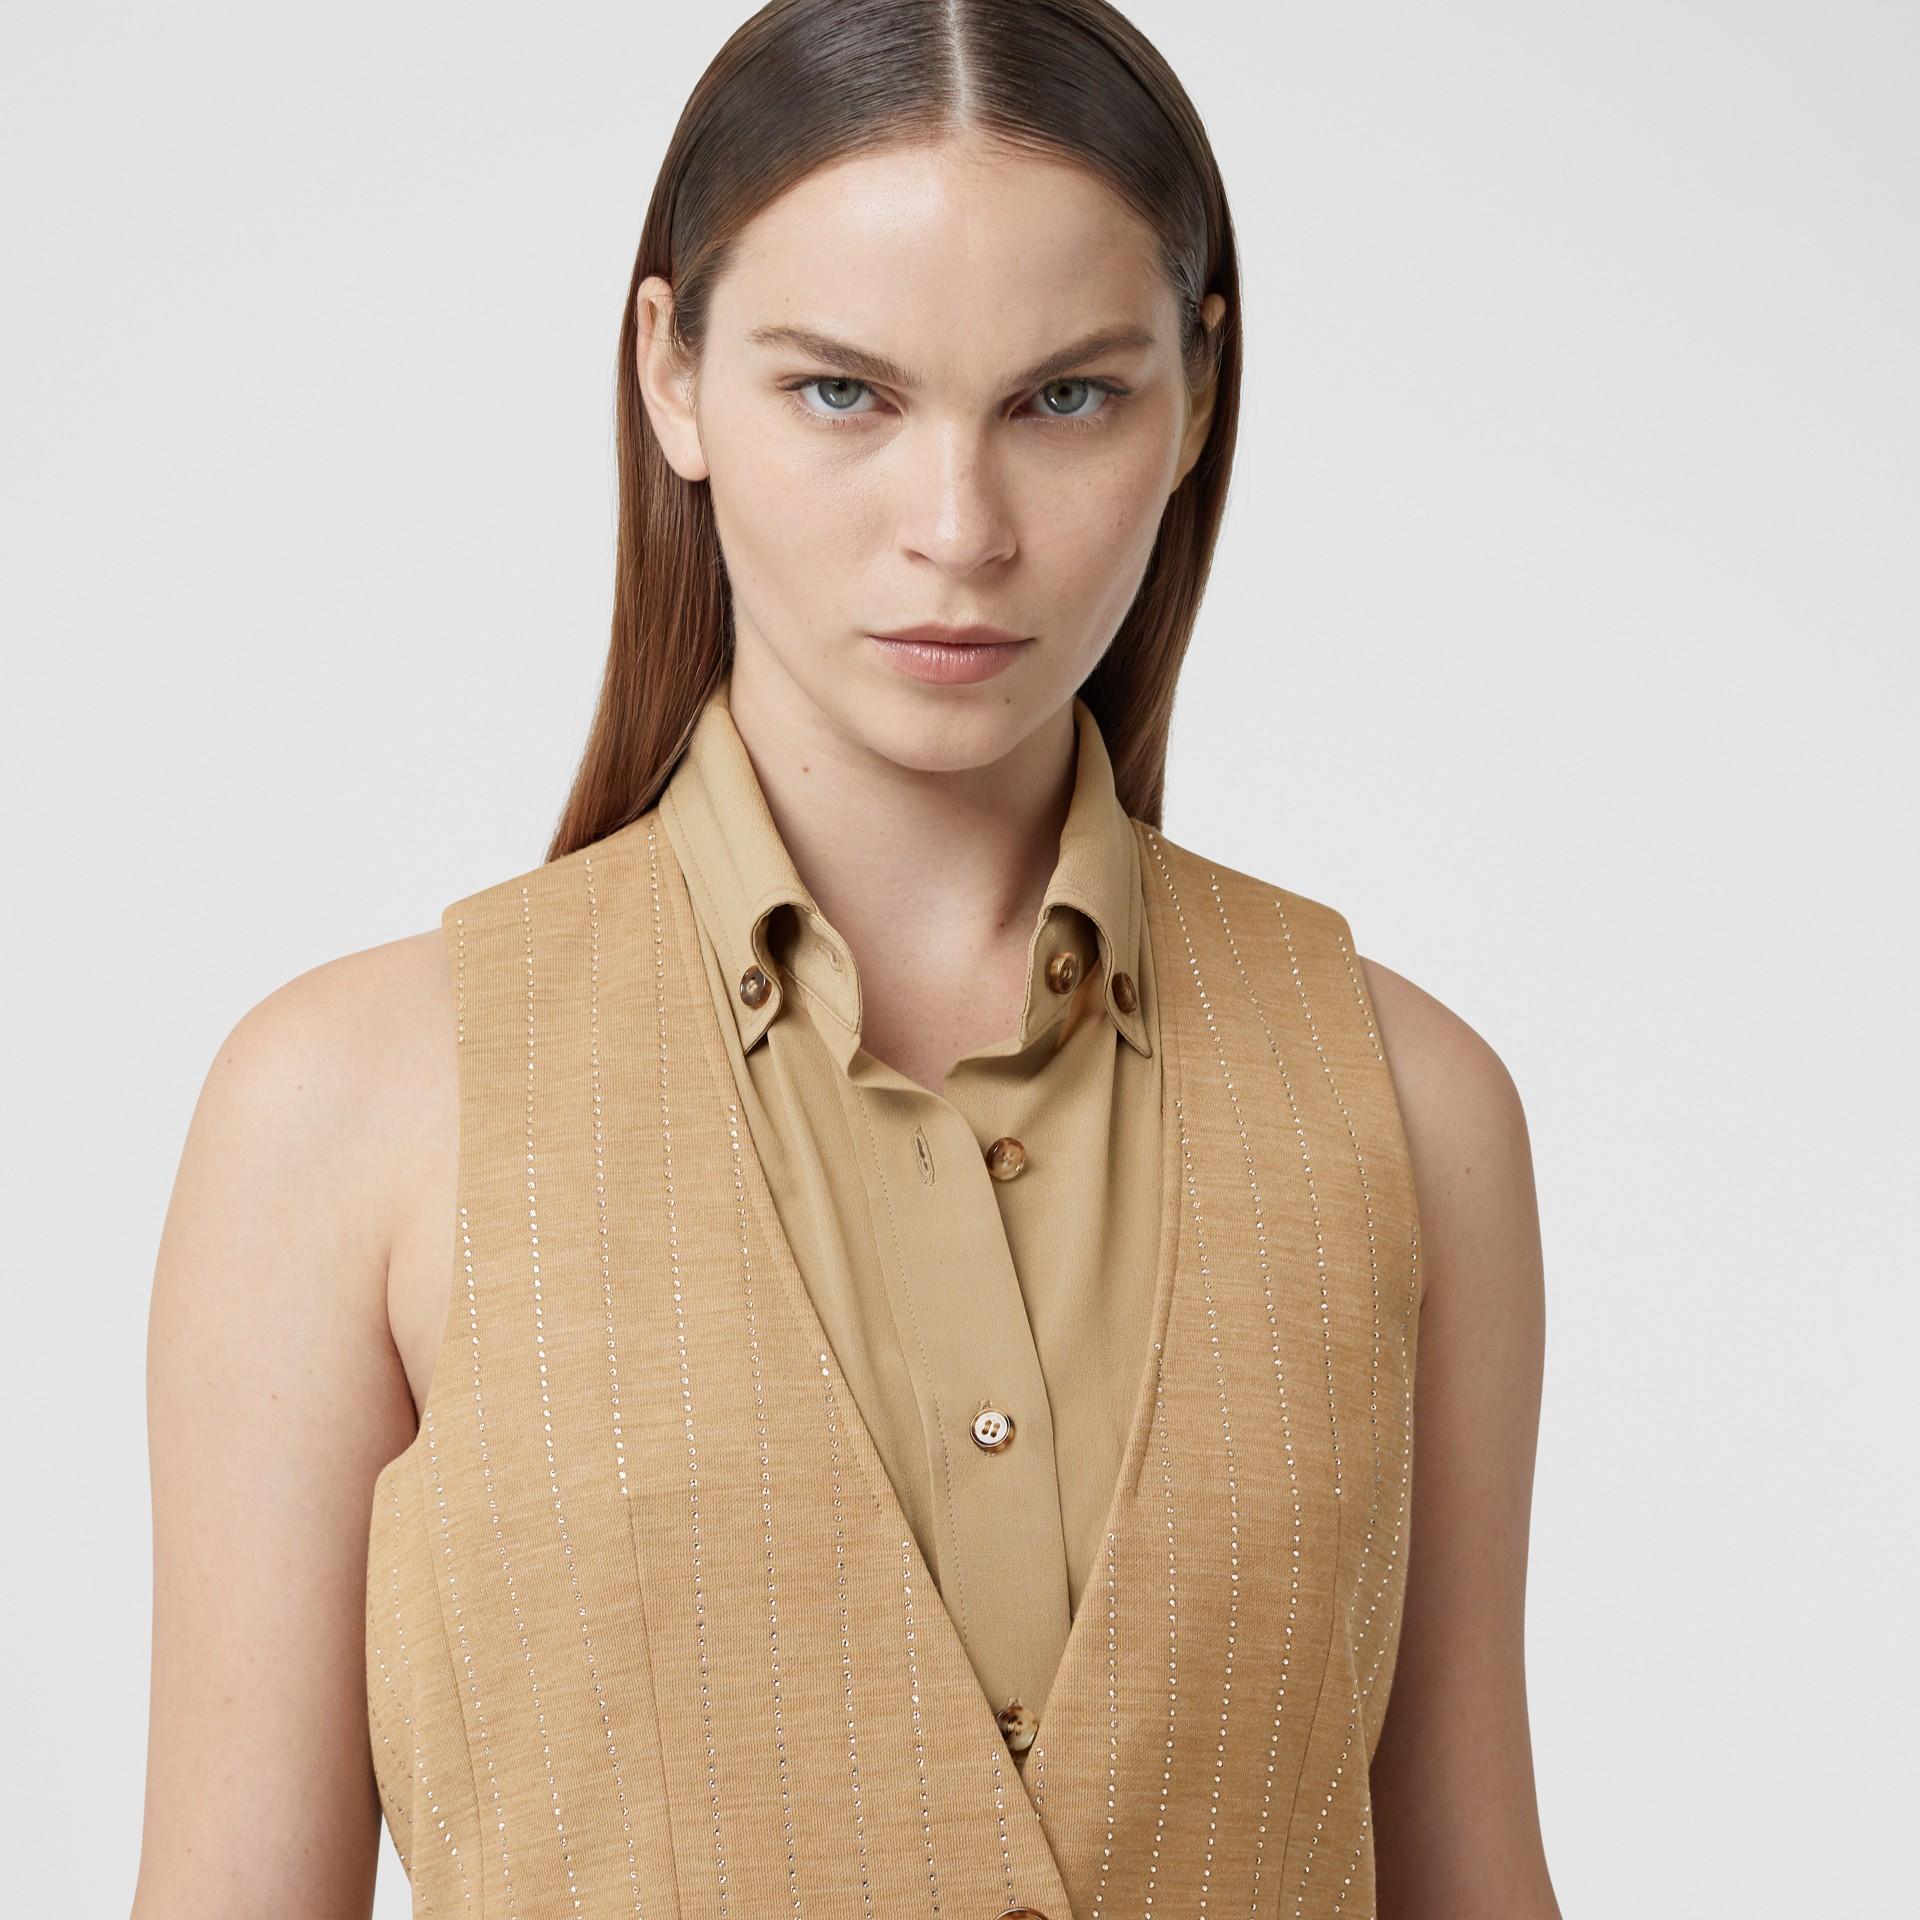 Shirt Detail Crystal Pinstriped Wool Blend Waistcoat in Pecan Melange - Women | Burberry - gallery image 1